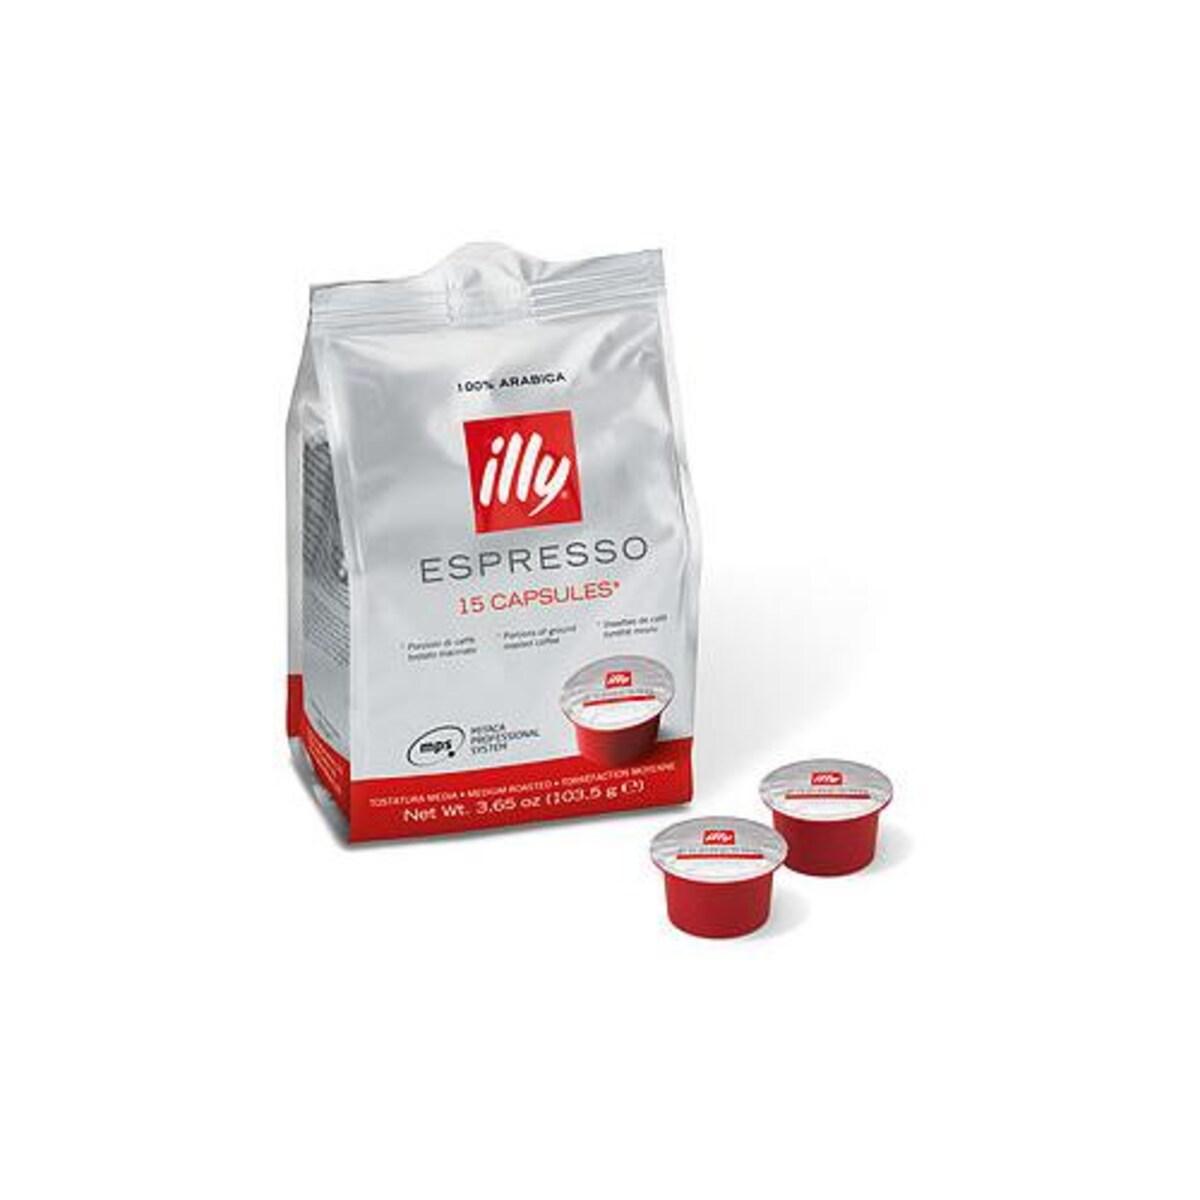 illy Espresso, 15 бр капсули, за illy MPS система